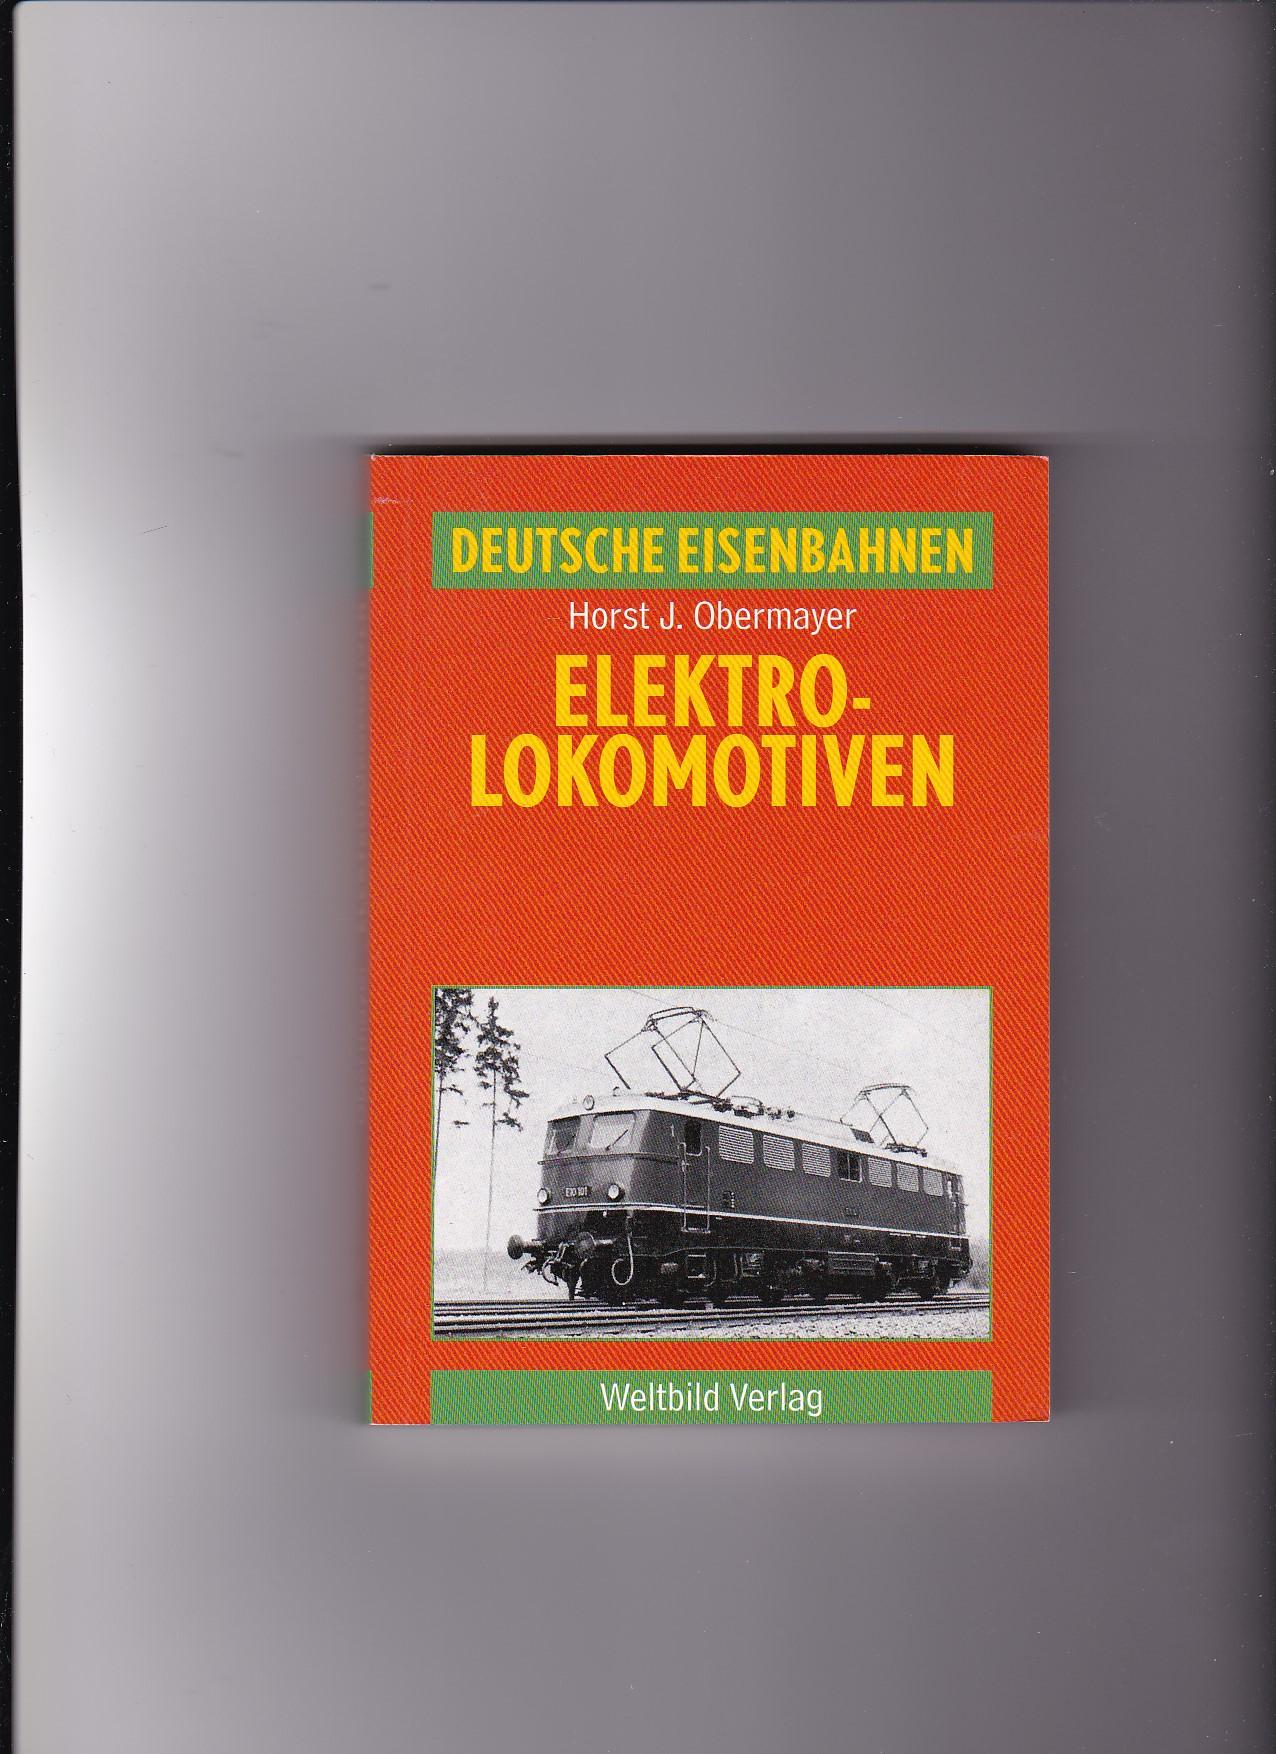 Horst J. Obermayer, Elektrolokomotiven / Deutsche Eisenbahnen: Horst Obermayer: